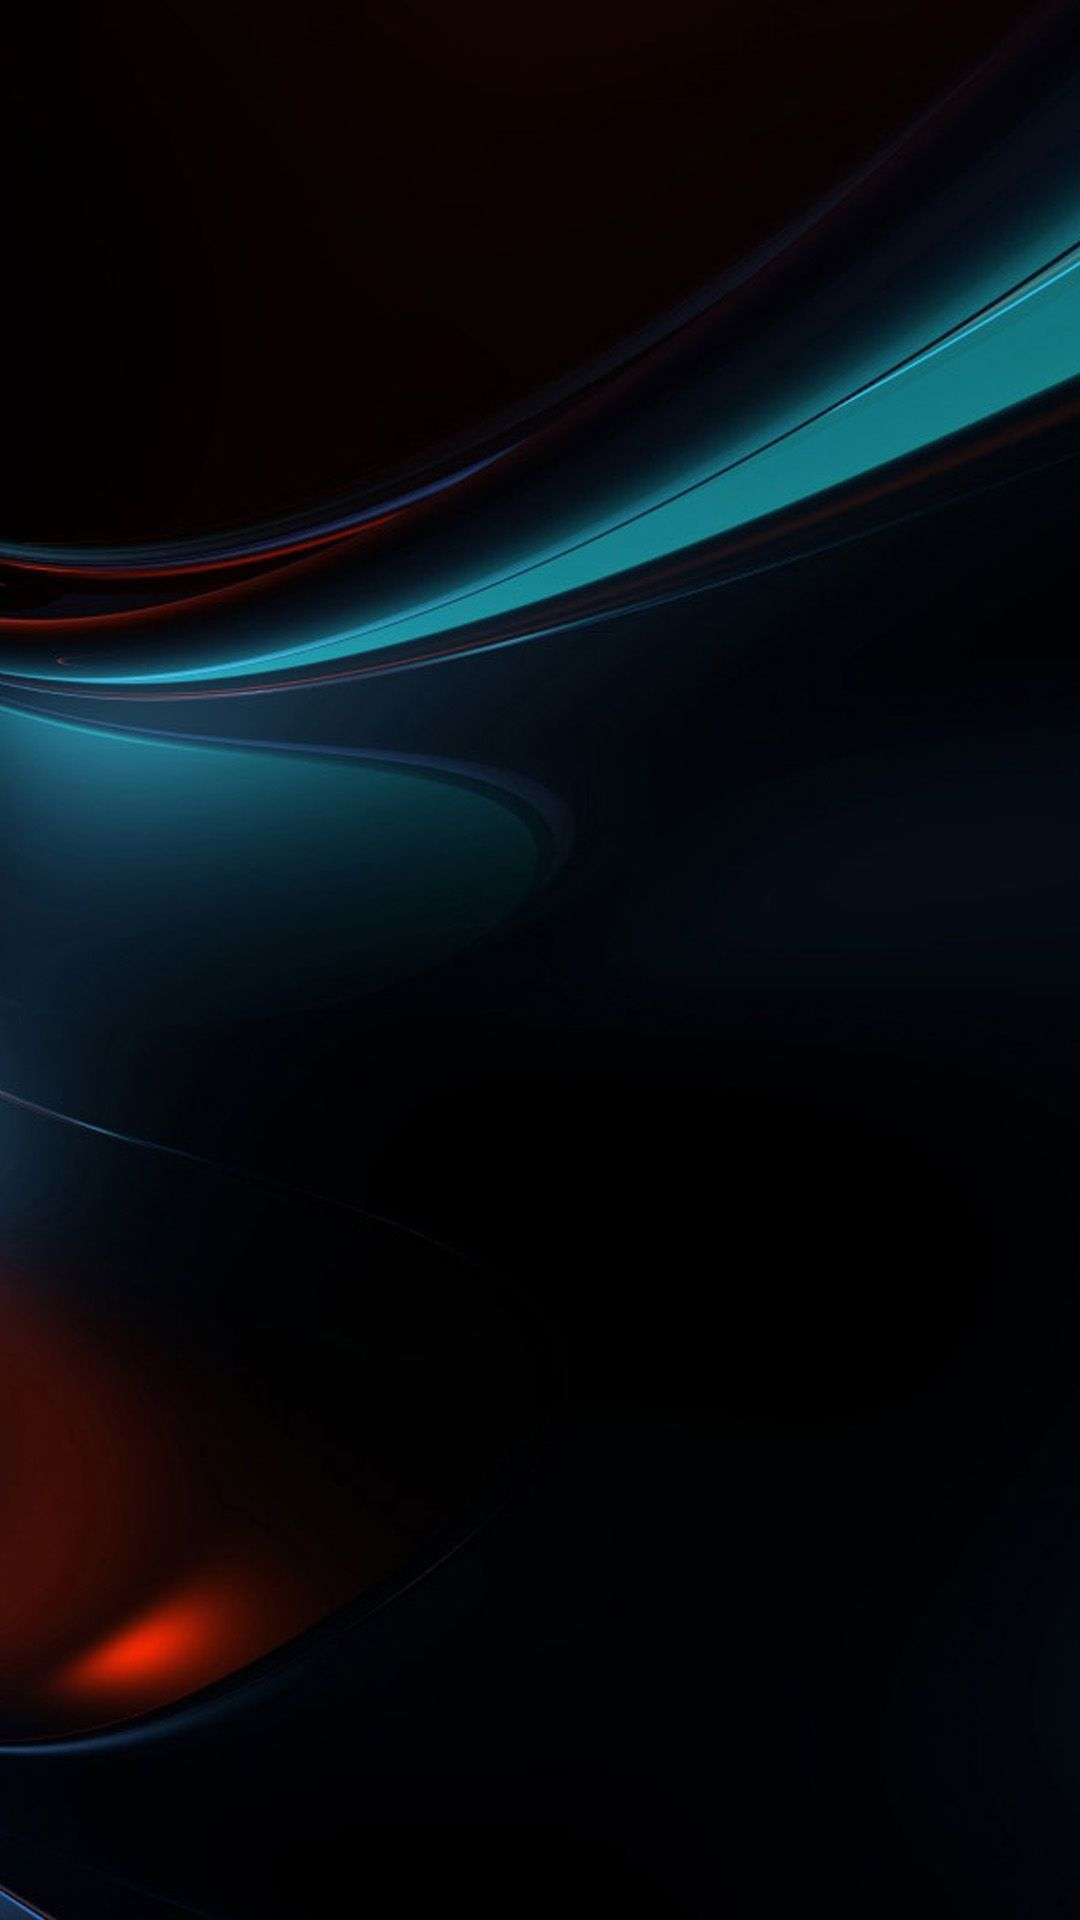 Black Abstract Wallpaper Phone 1080x1920 Download Hd Wallpaper Wallpapertip